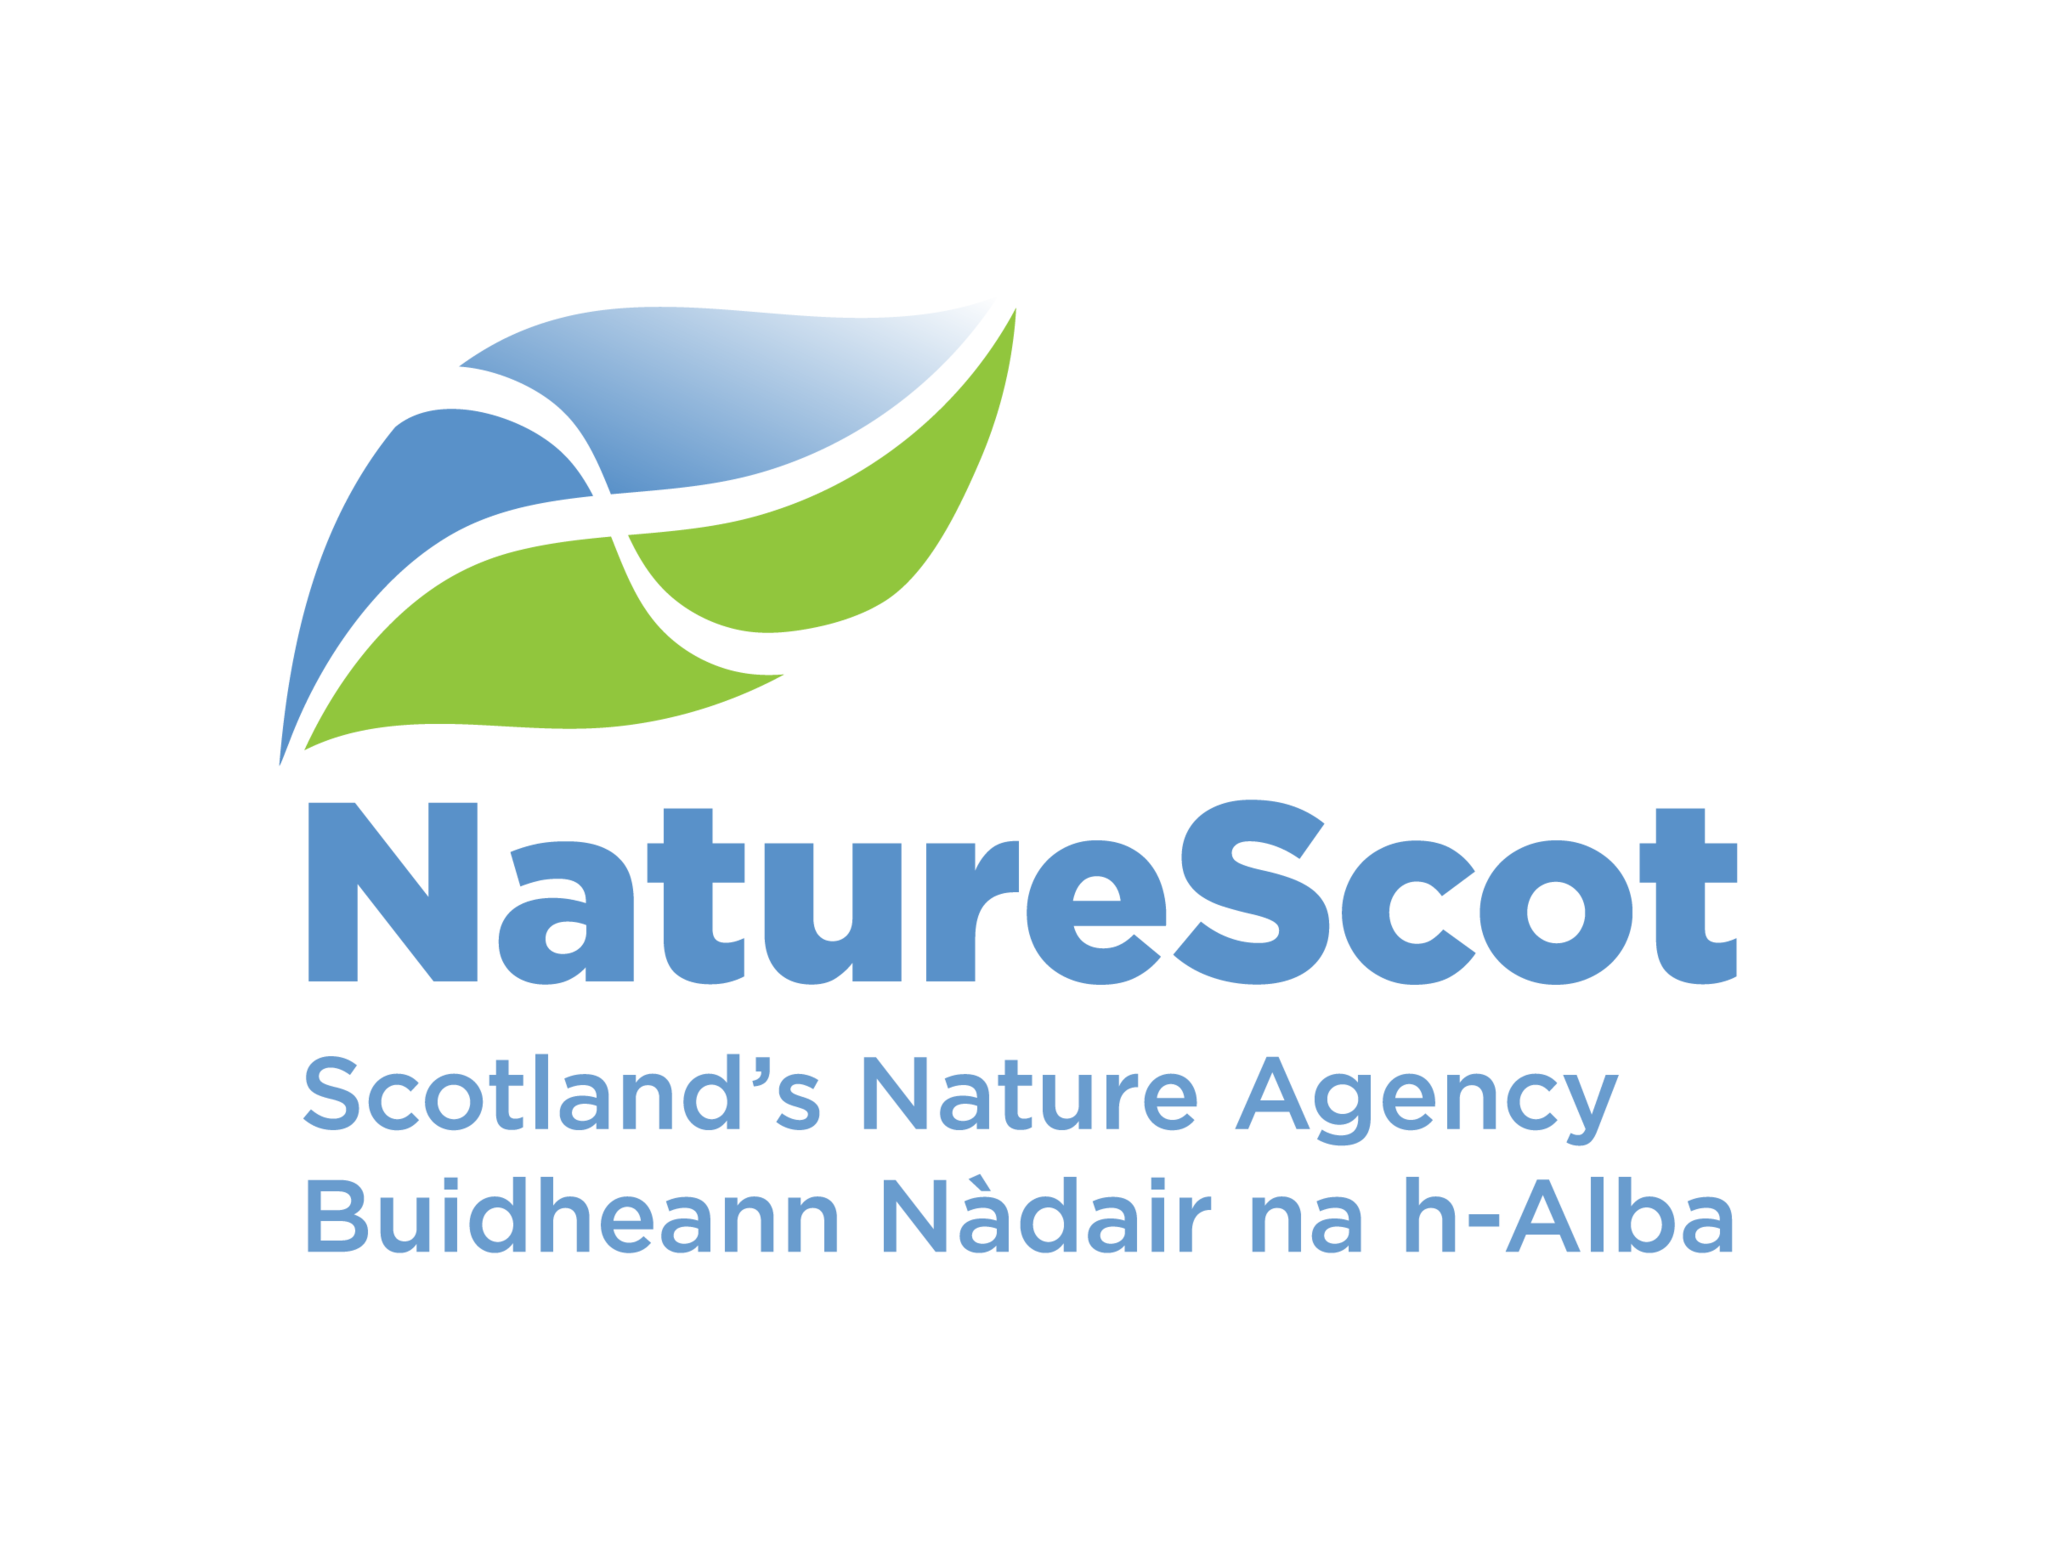 NatureScot